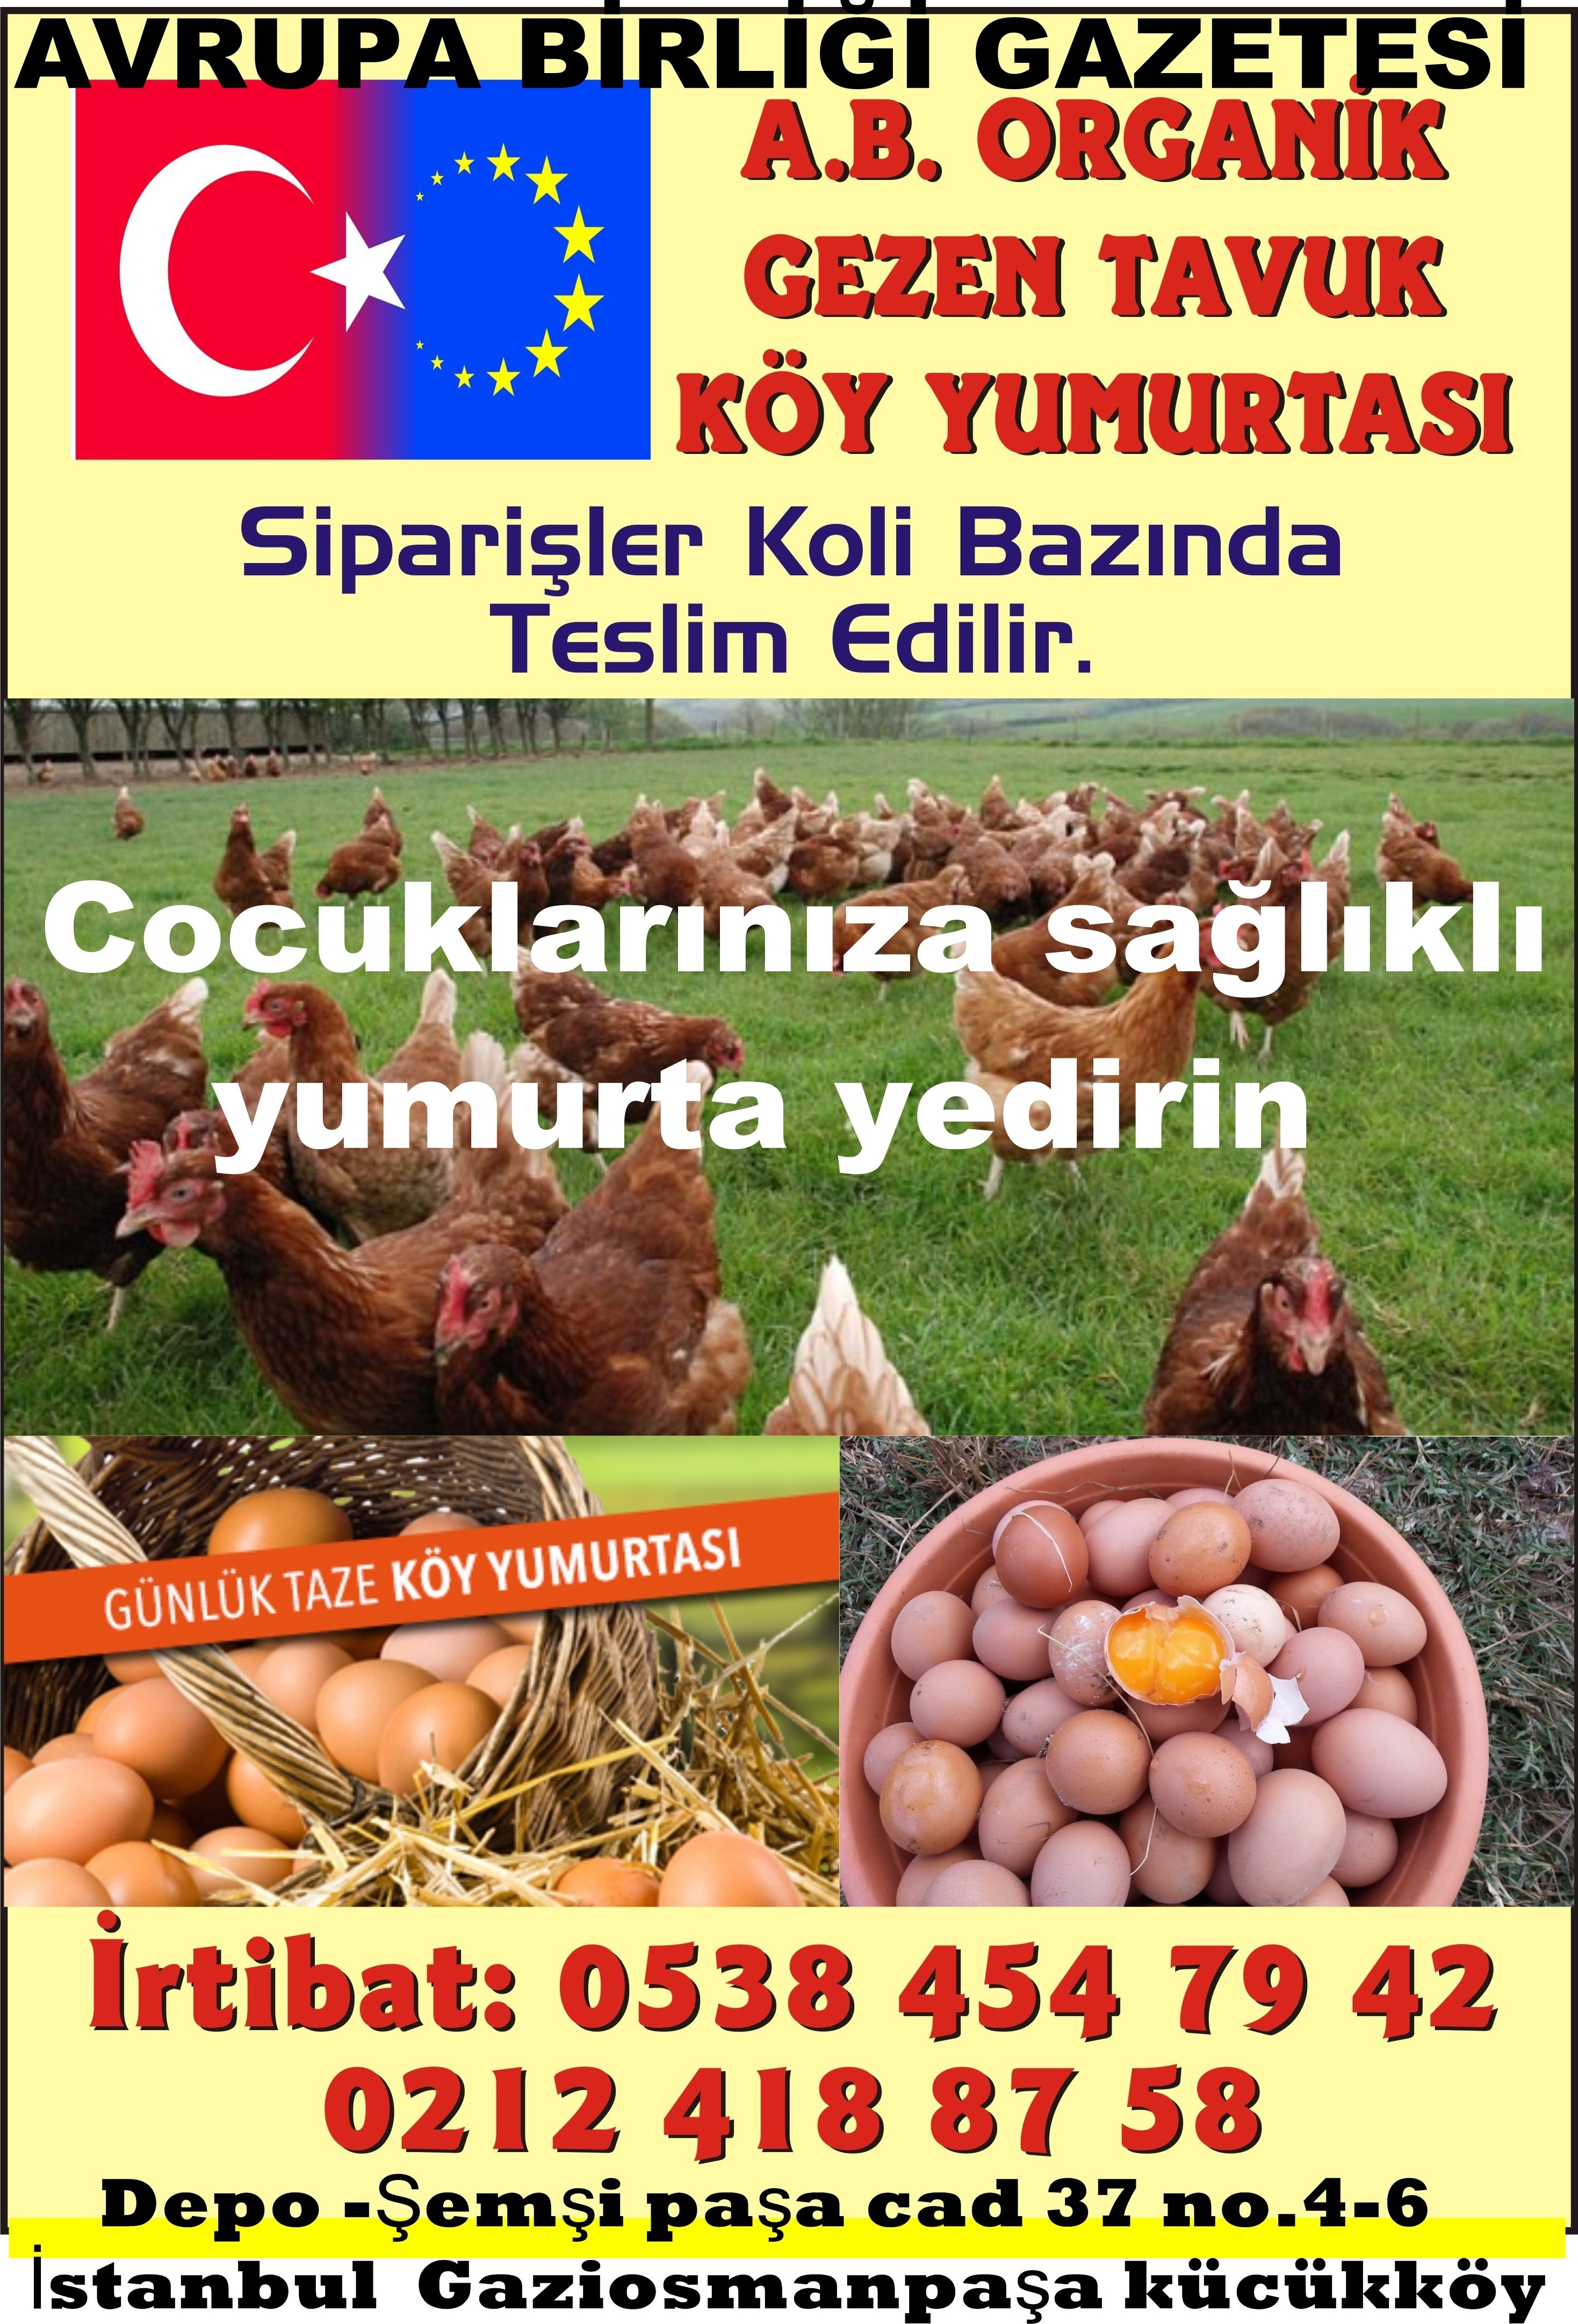 organik gezen tavuk köy yumurtası